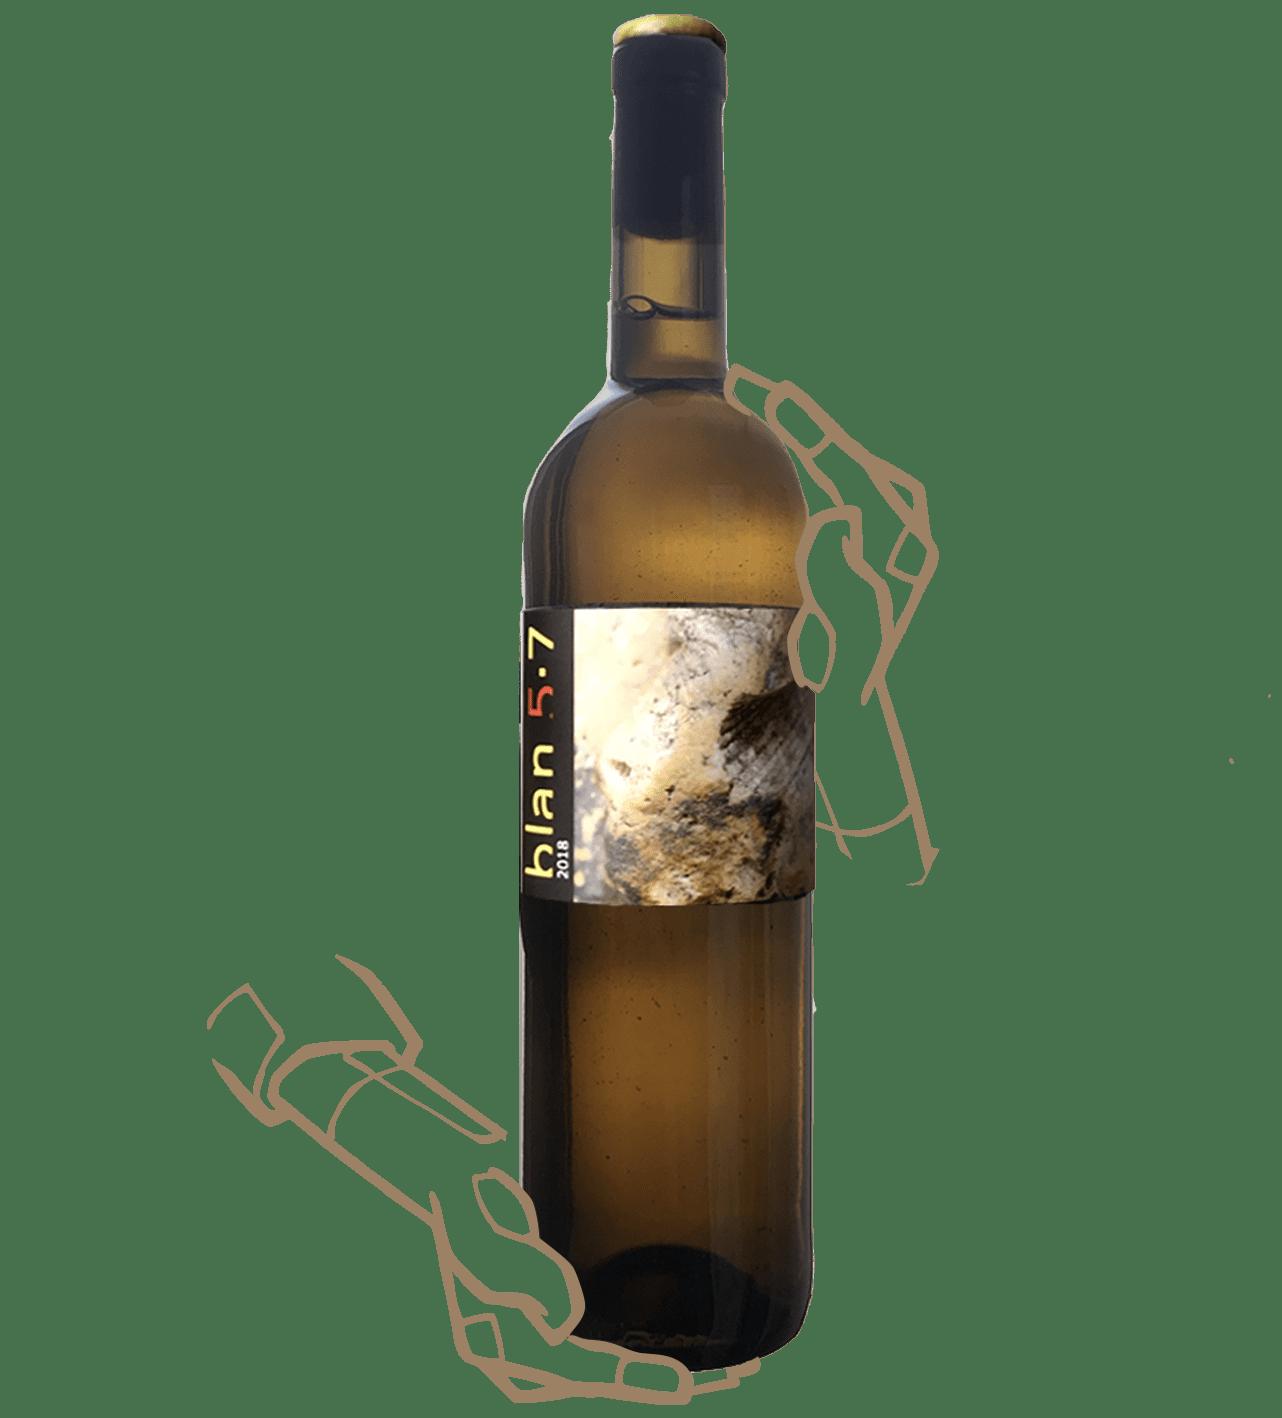 blan 5.7 de jordi lorens est un vin orange naturel